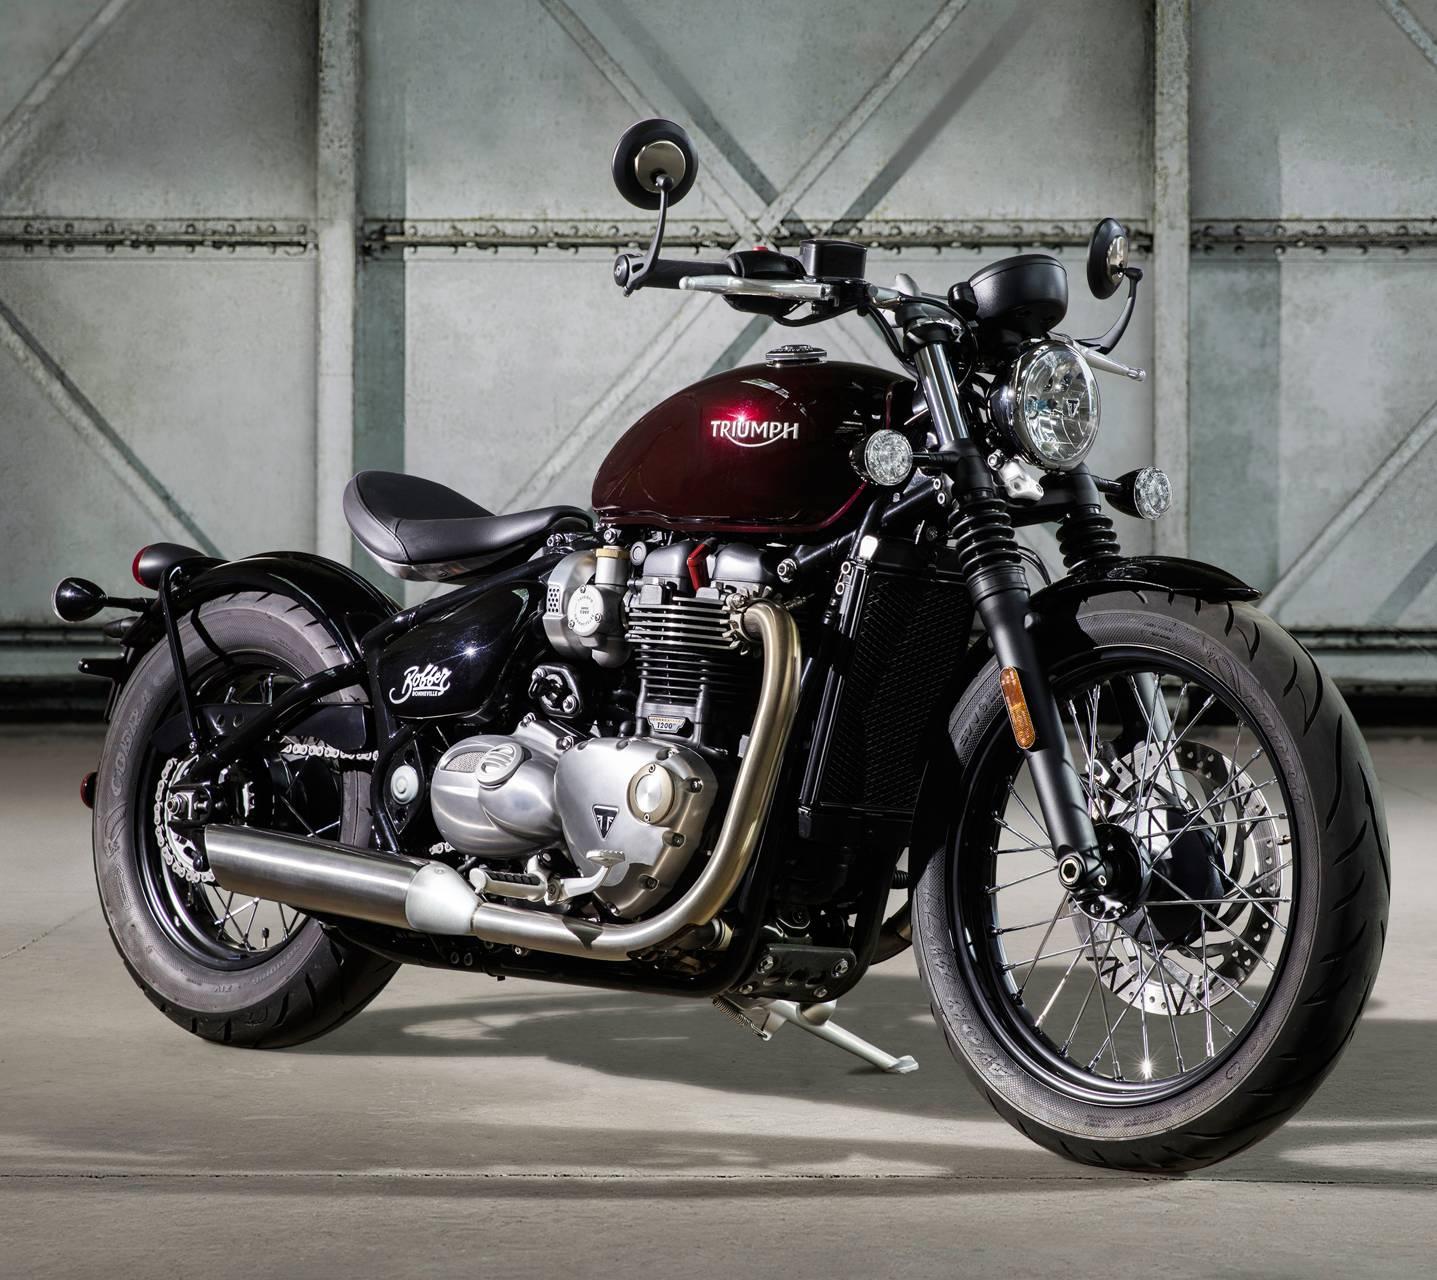 Triumph Motorcycle Wallpaper: Bonneville Bobber Wallpaper By Junin__RX